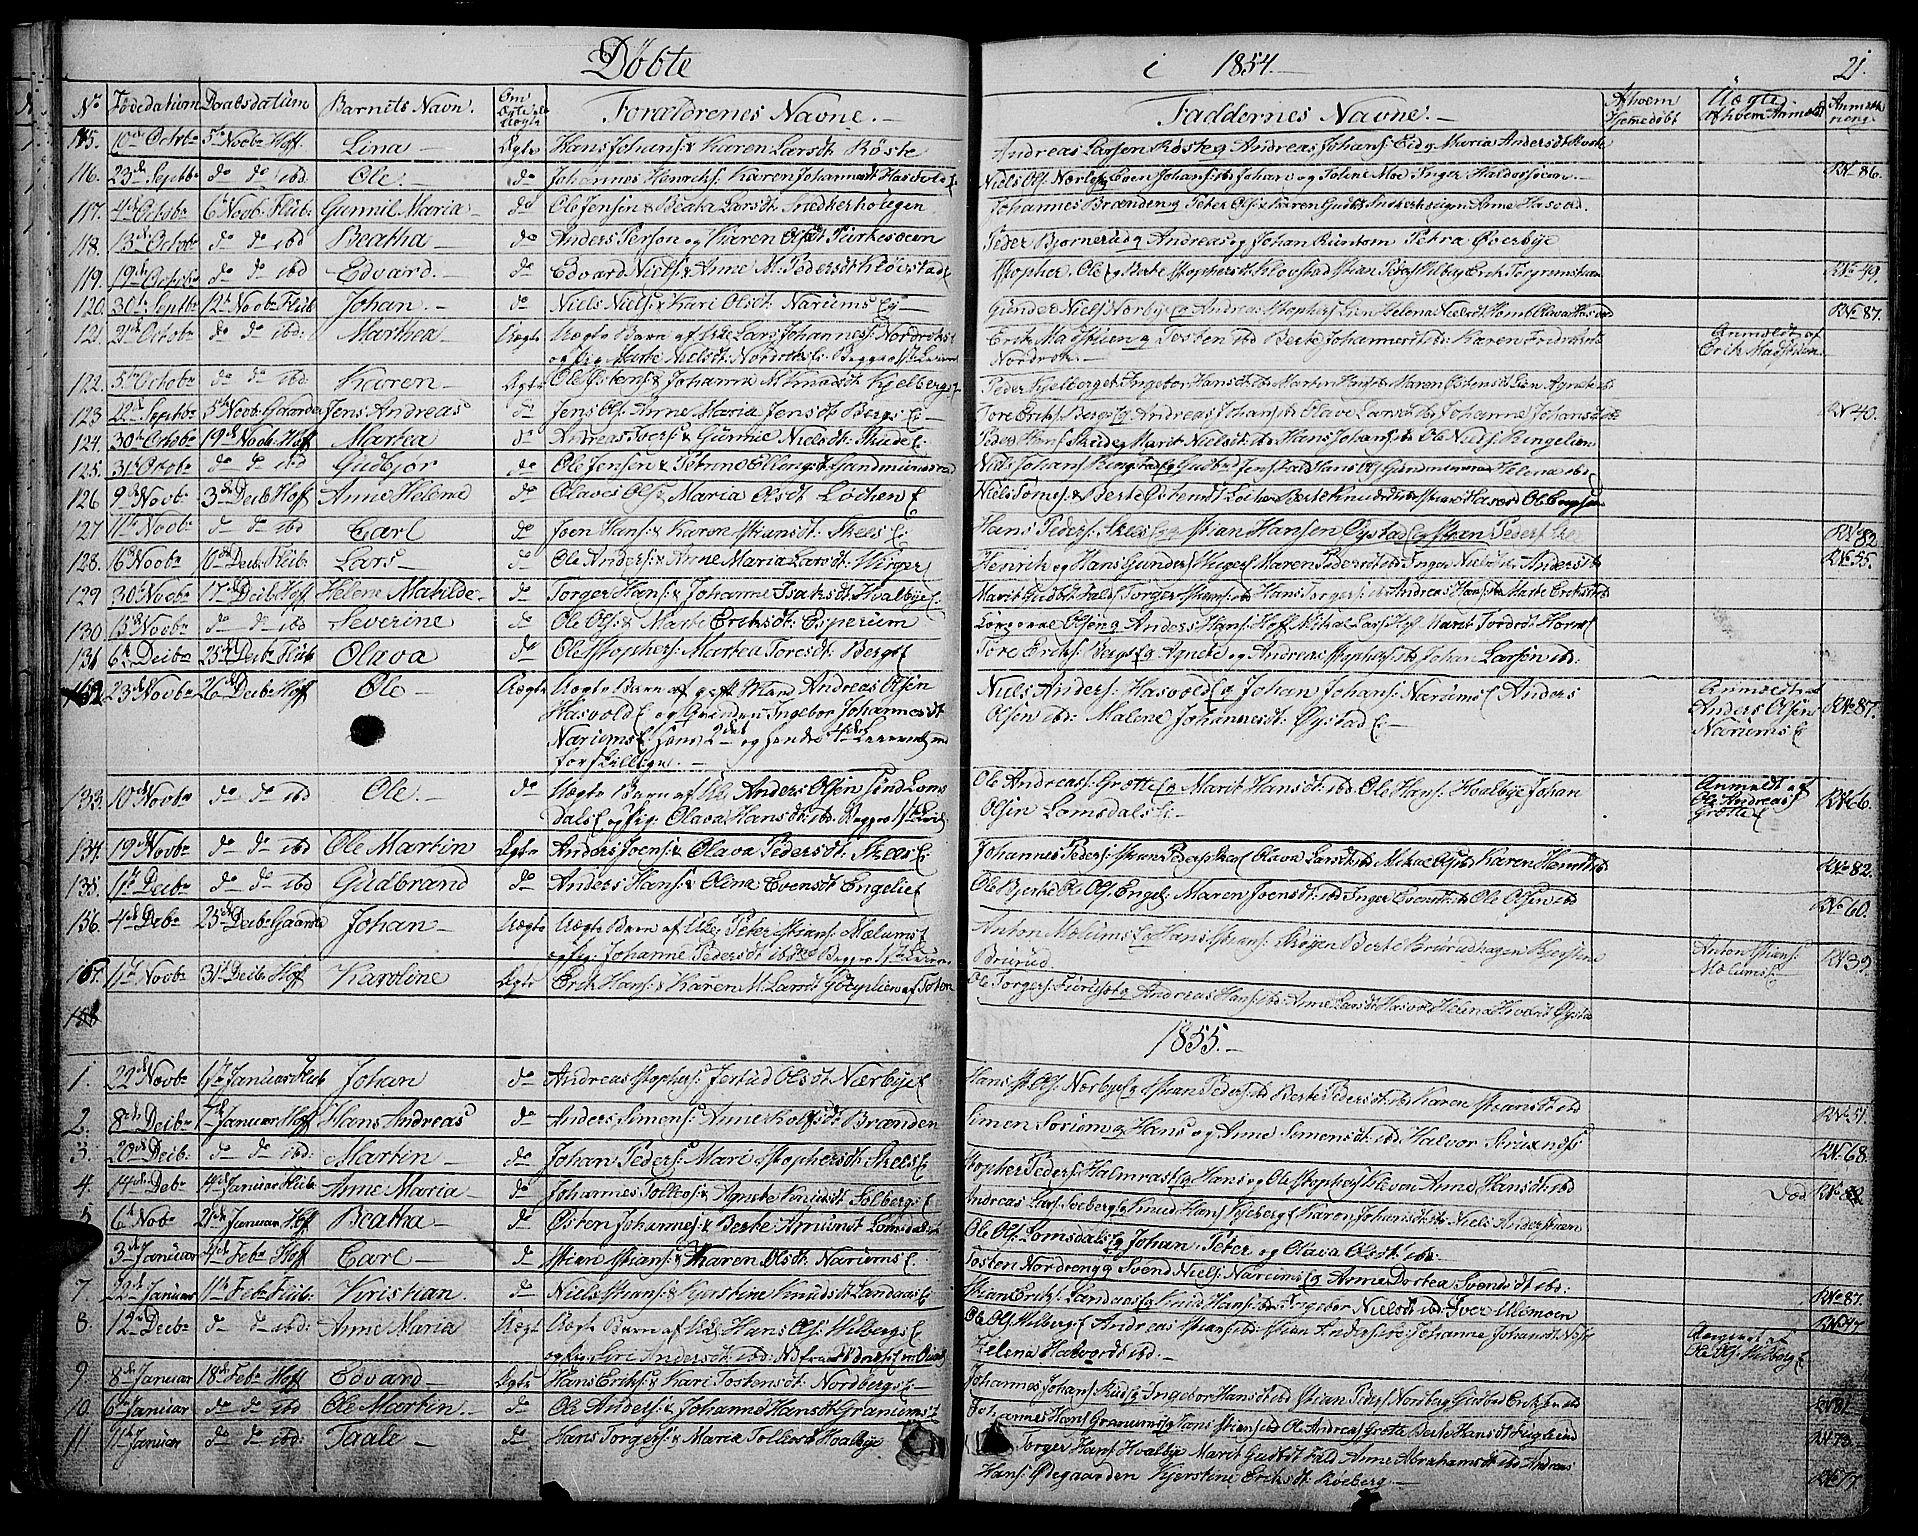 SAH, Søndre Land prestekontor, L/L0001: Klokkerbok nr. 1, 1849-1883, s. 21